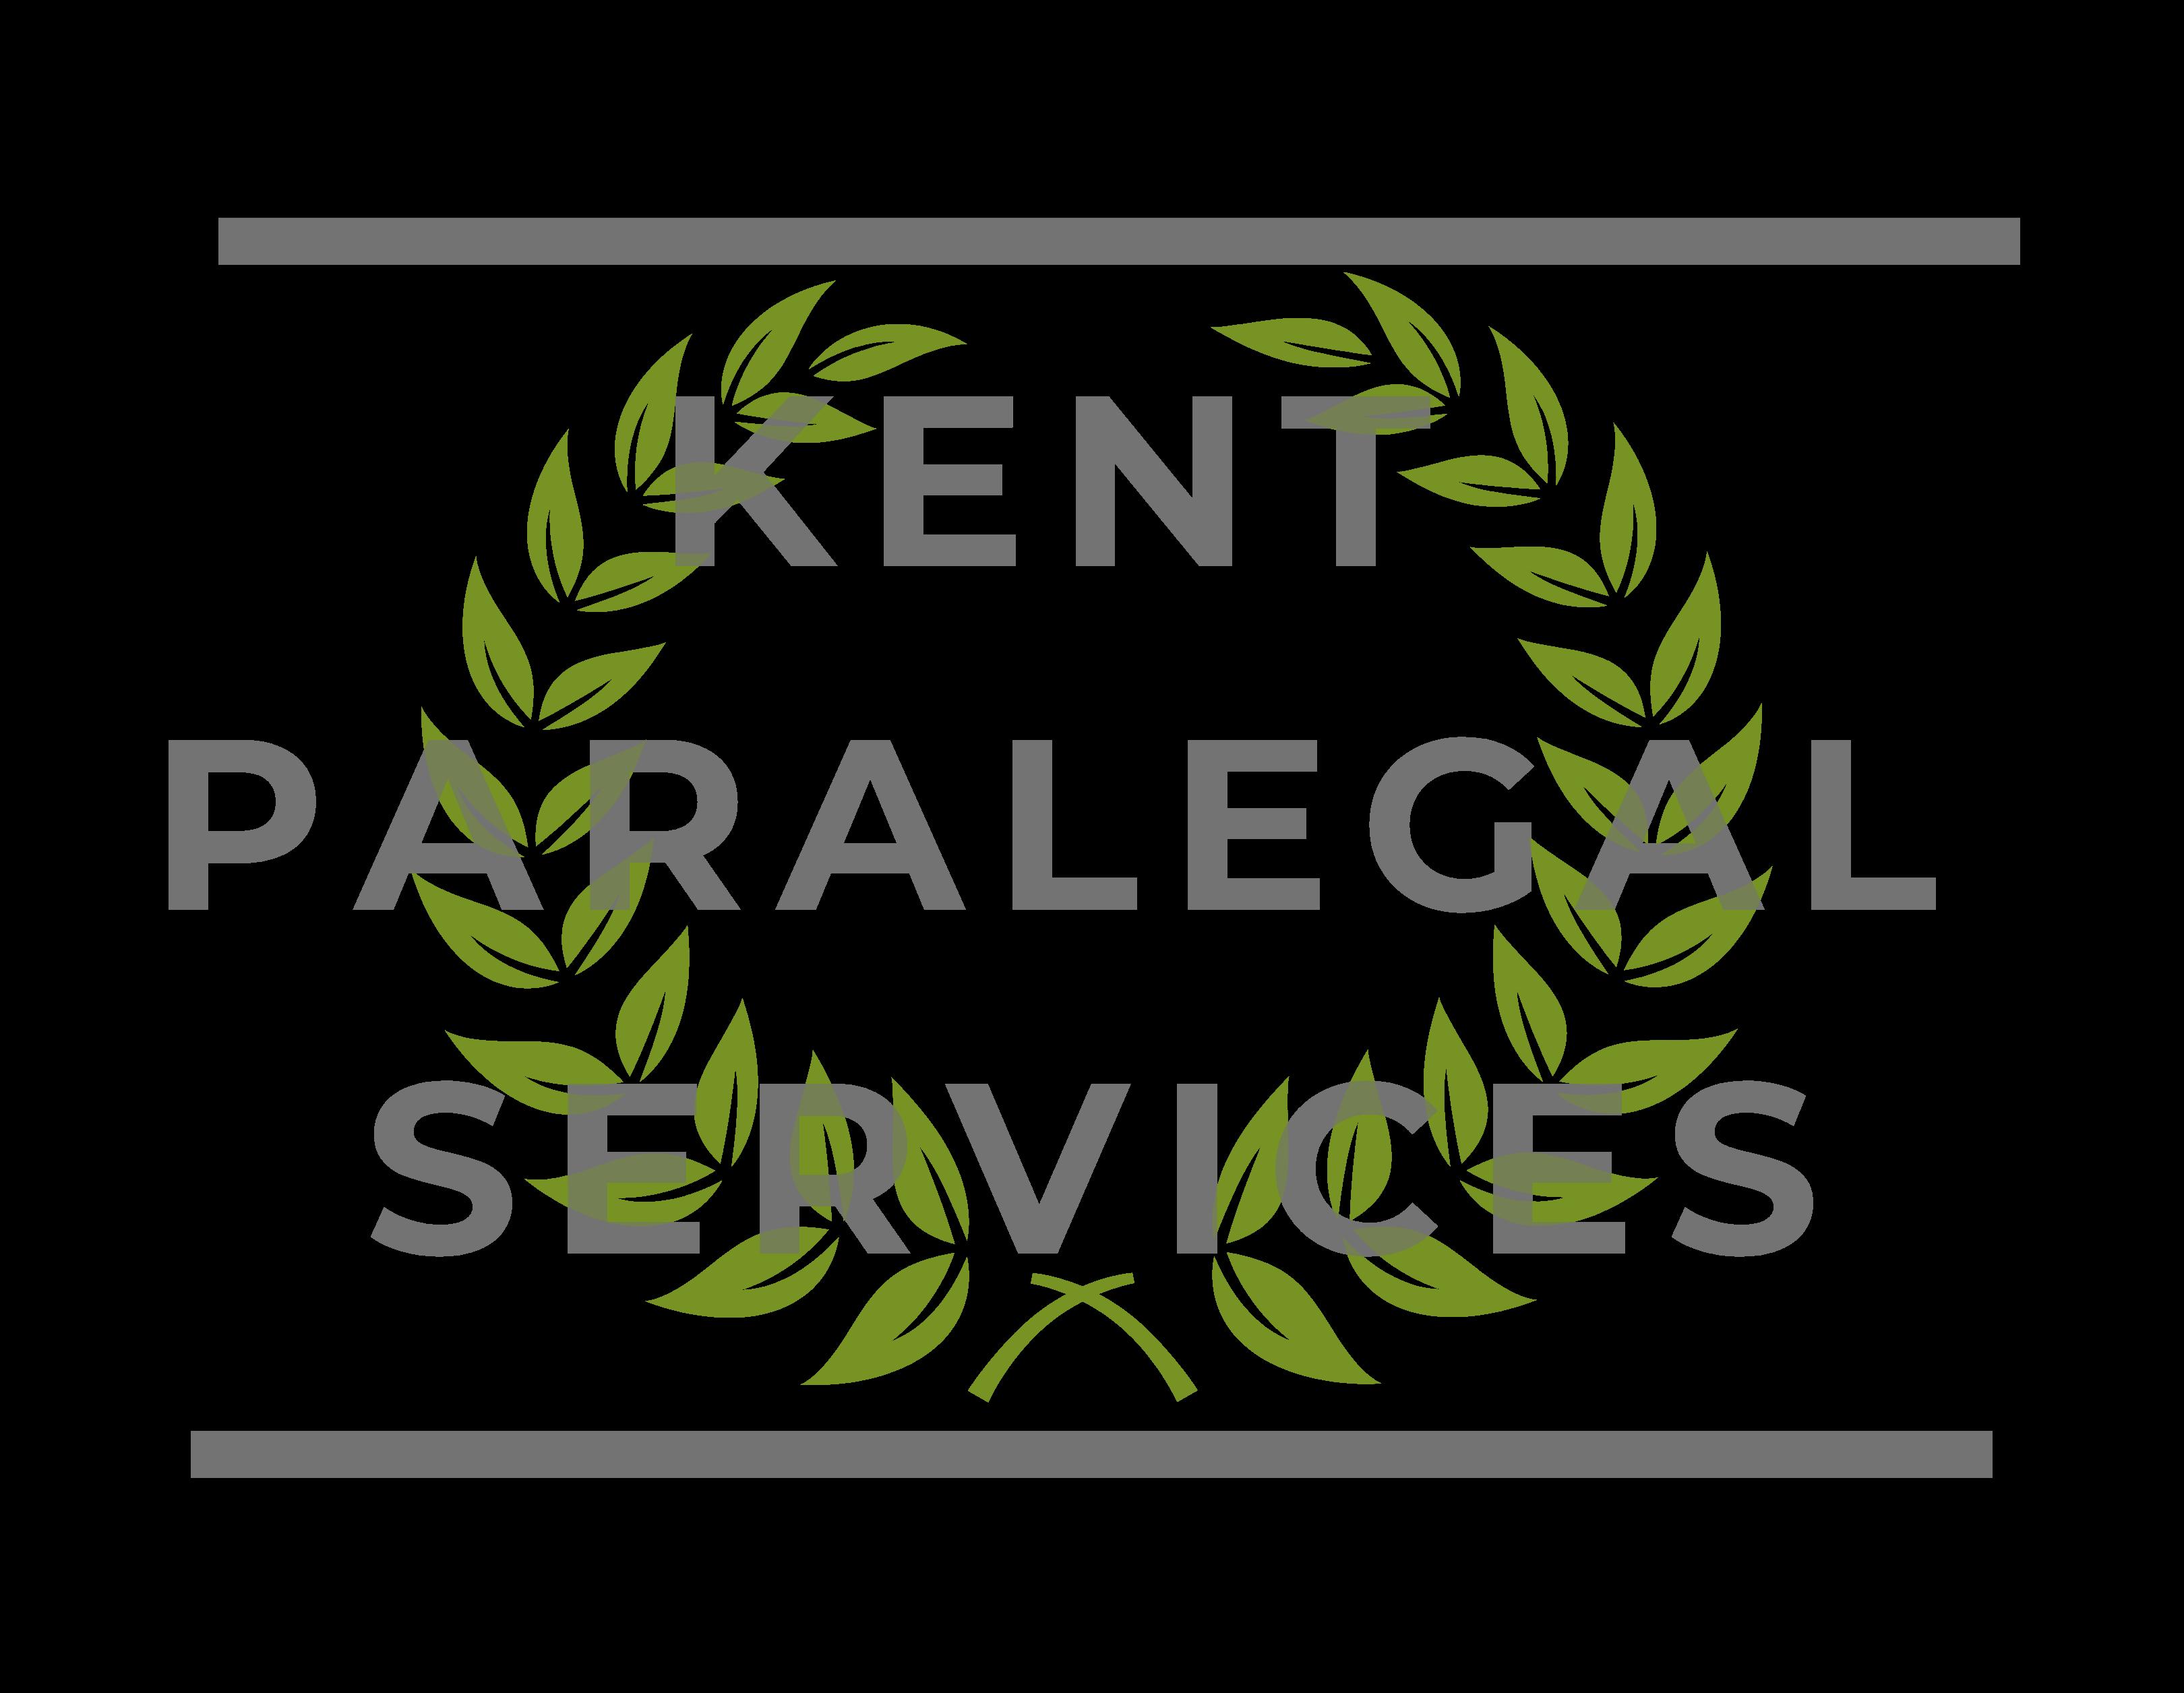 Kent Paralegal Services